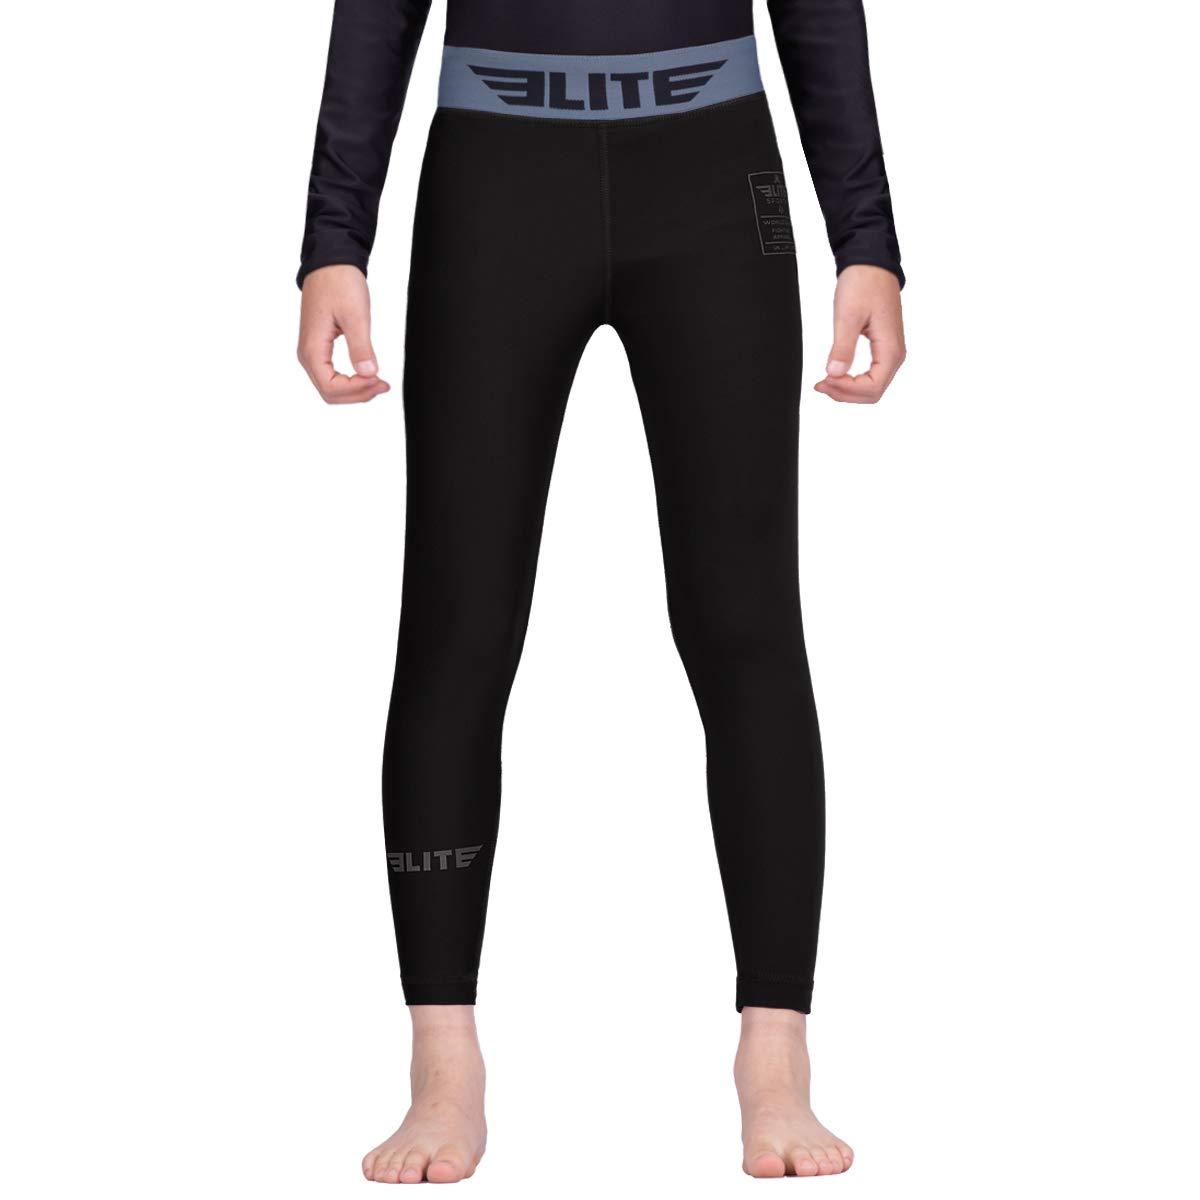 Kids Jiu Jitsu Compression Base Layer Training Workout Pants Elite Sports Kids MMA BJJ Athletic Spats Leggings Tights